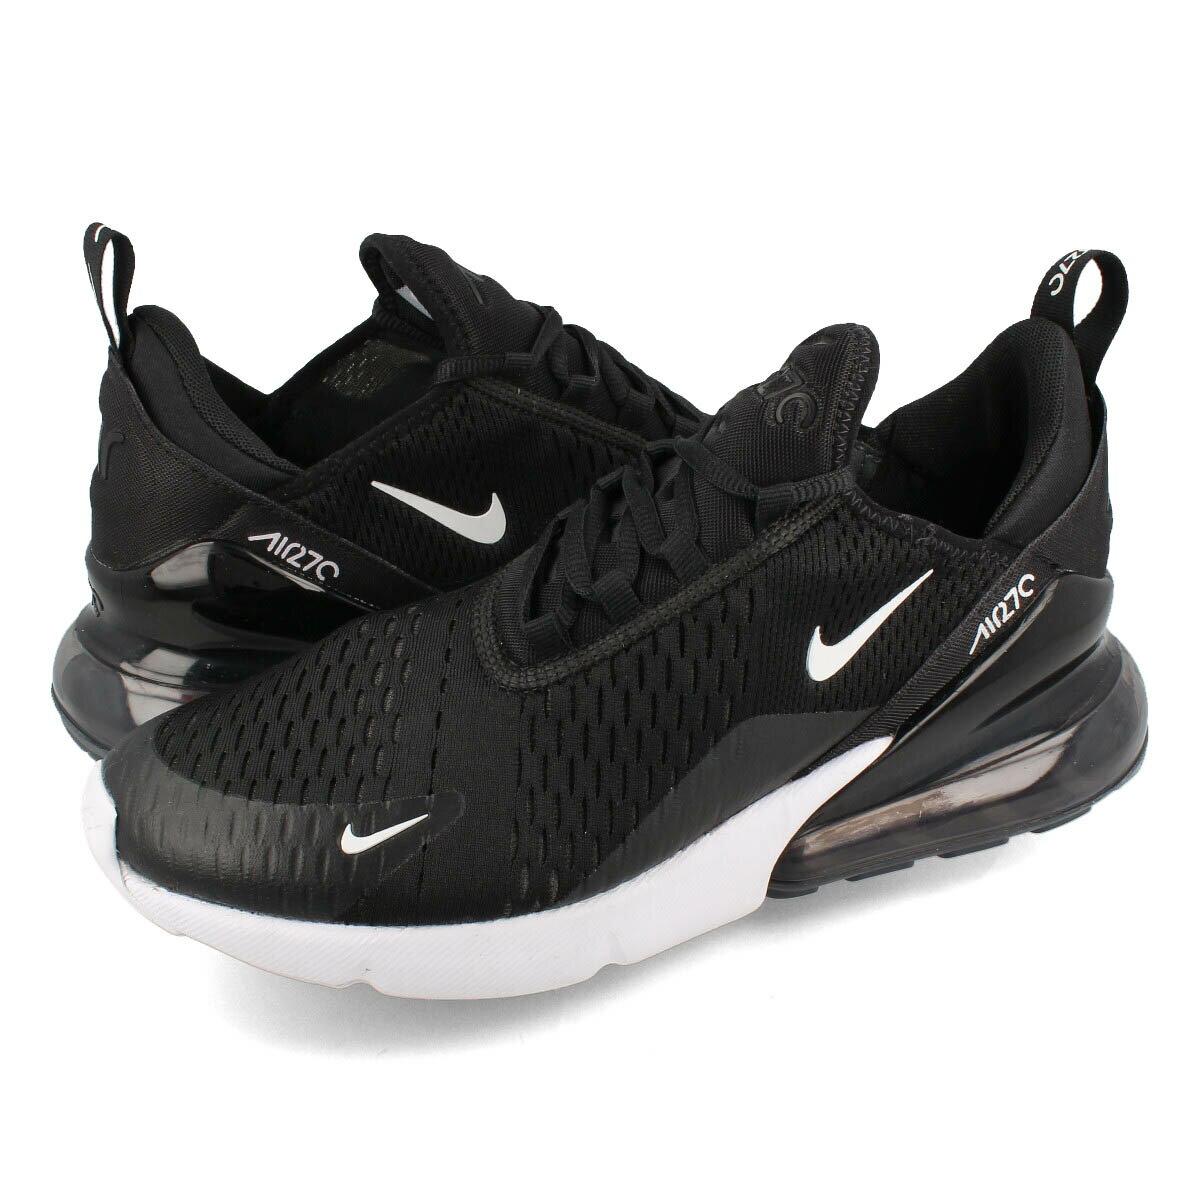 611a121d9a0b1 air max 95 kick on fire pl The Nike Air Zoom Mariah Flyknit ...